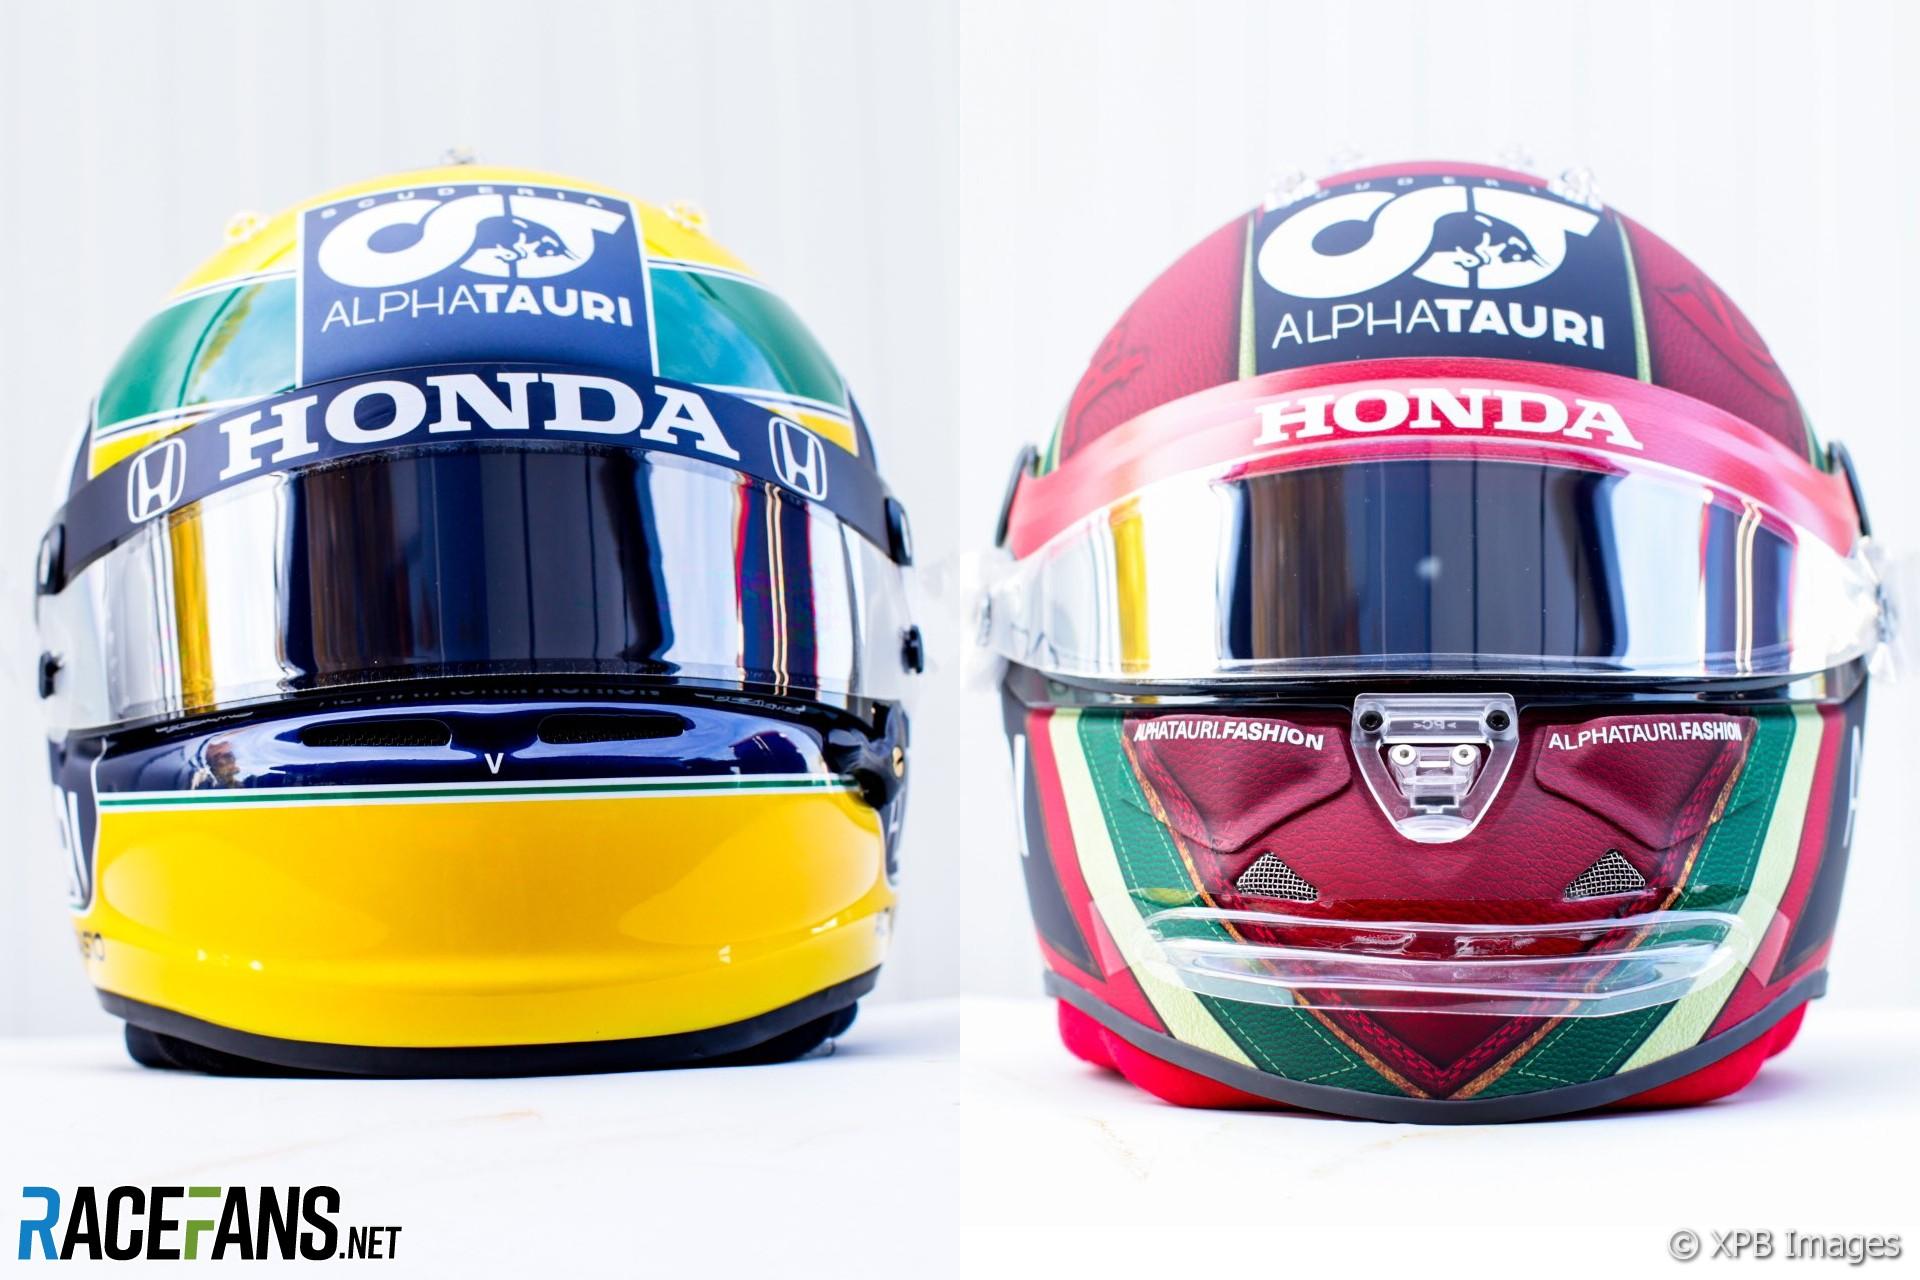 Pierre Gasly and Daniil Kvyat's Emilia-Romagna Grand Prix helmets, 2020